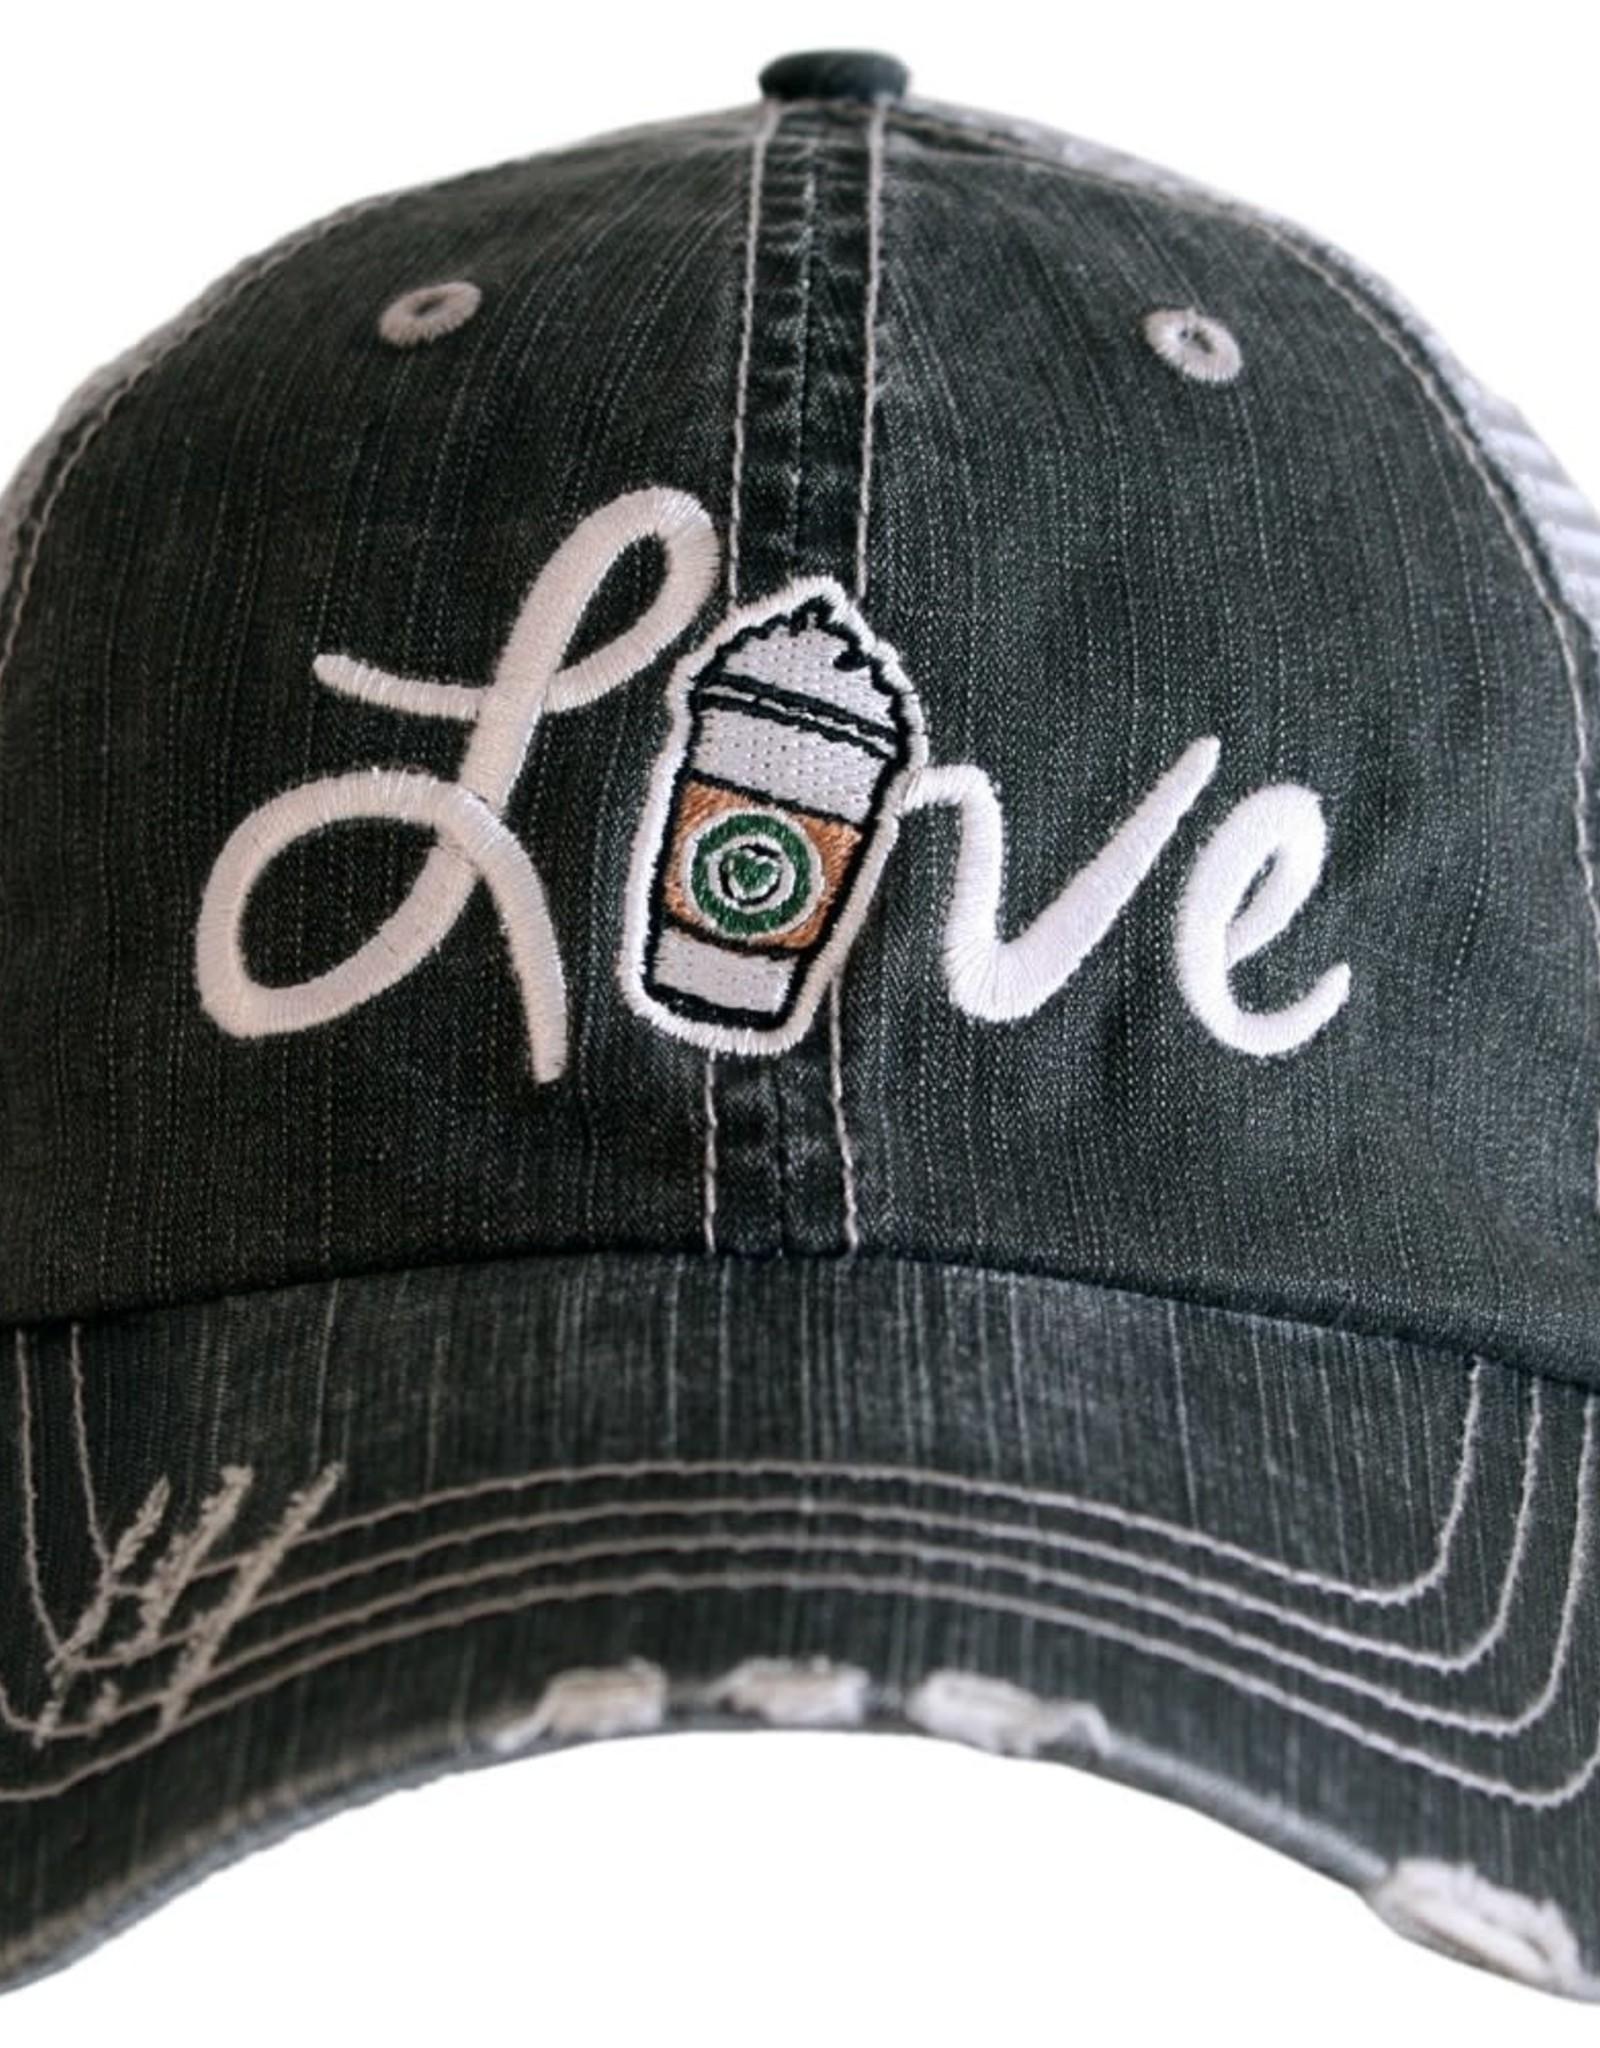 TLC LOVE STARBUCKS TRUCKER HAT